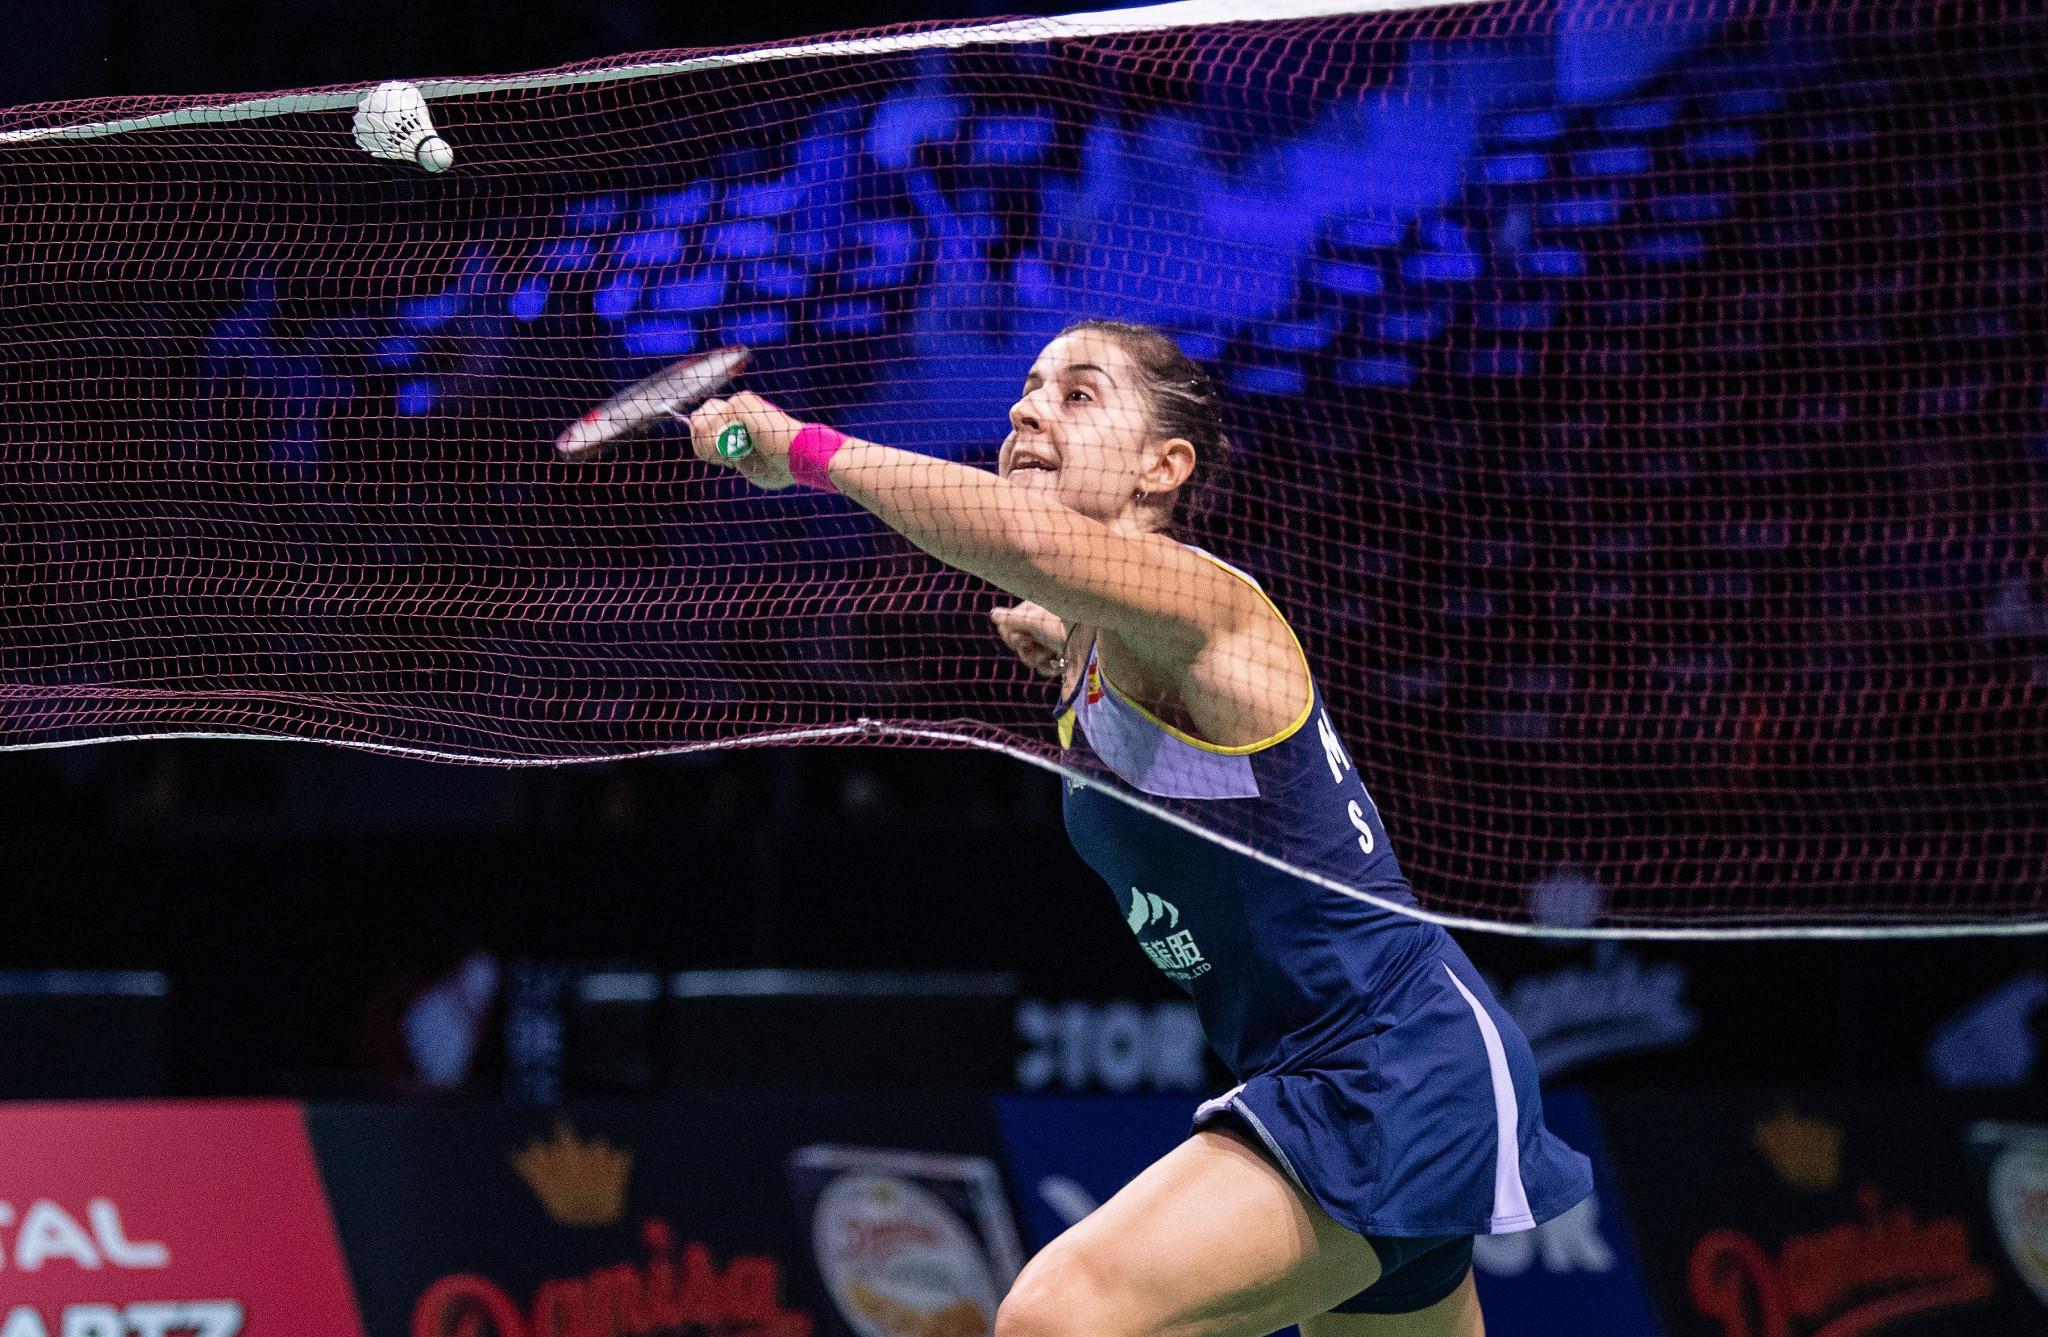 Marín makes women's singles final at Syed Modi International Badminton Championships